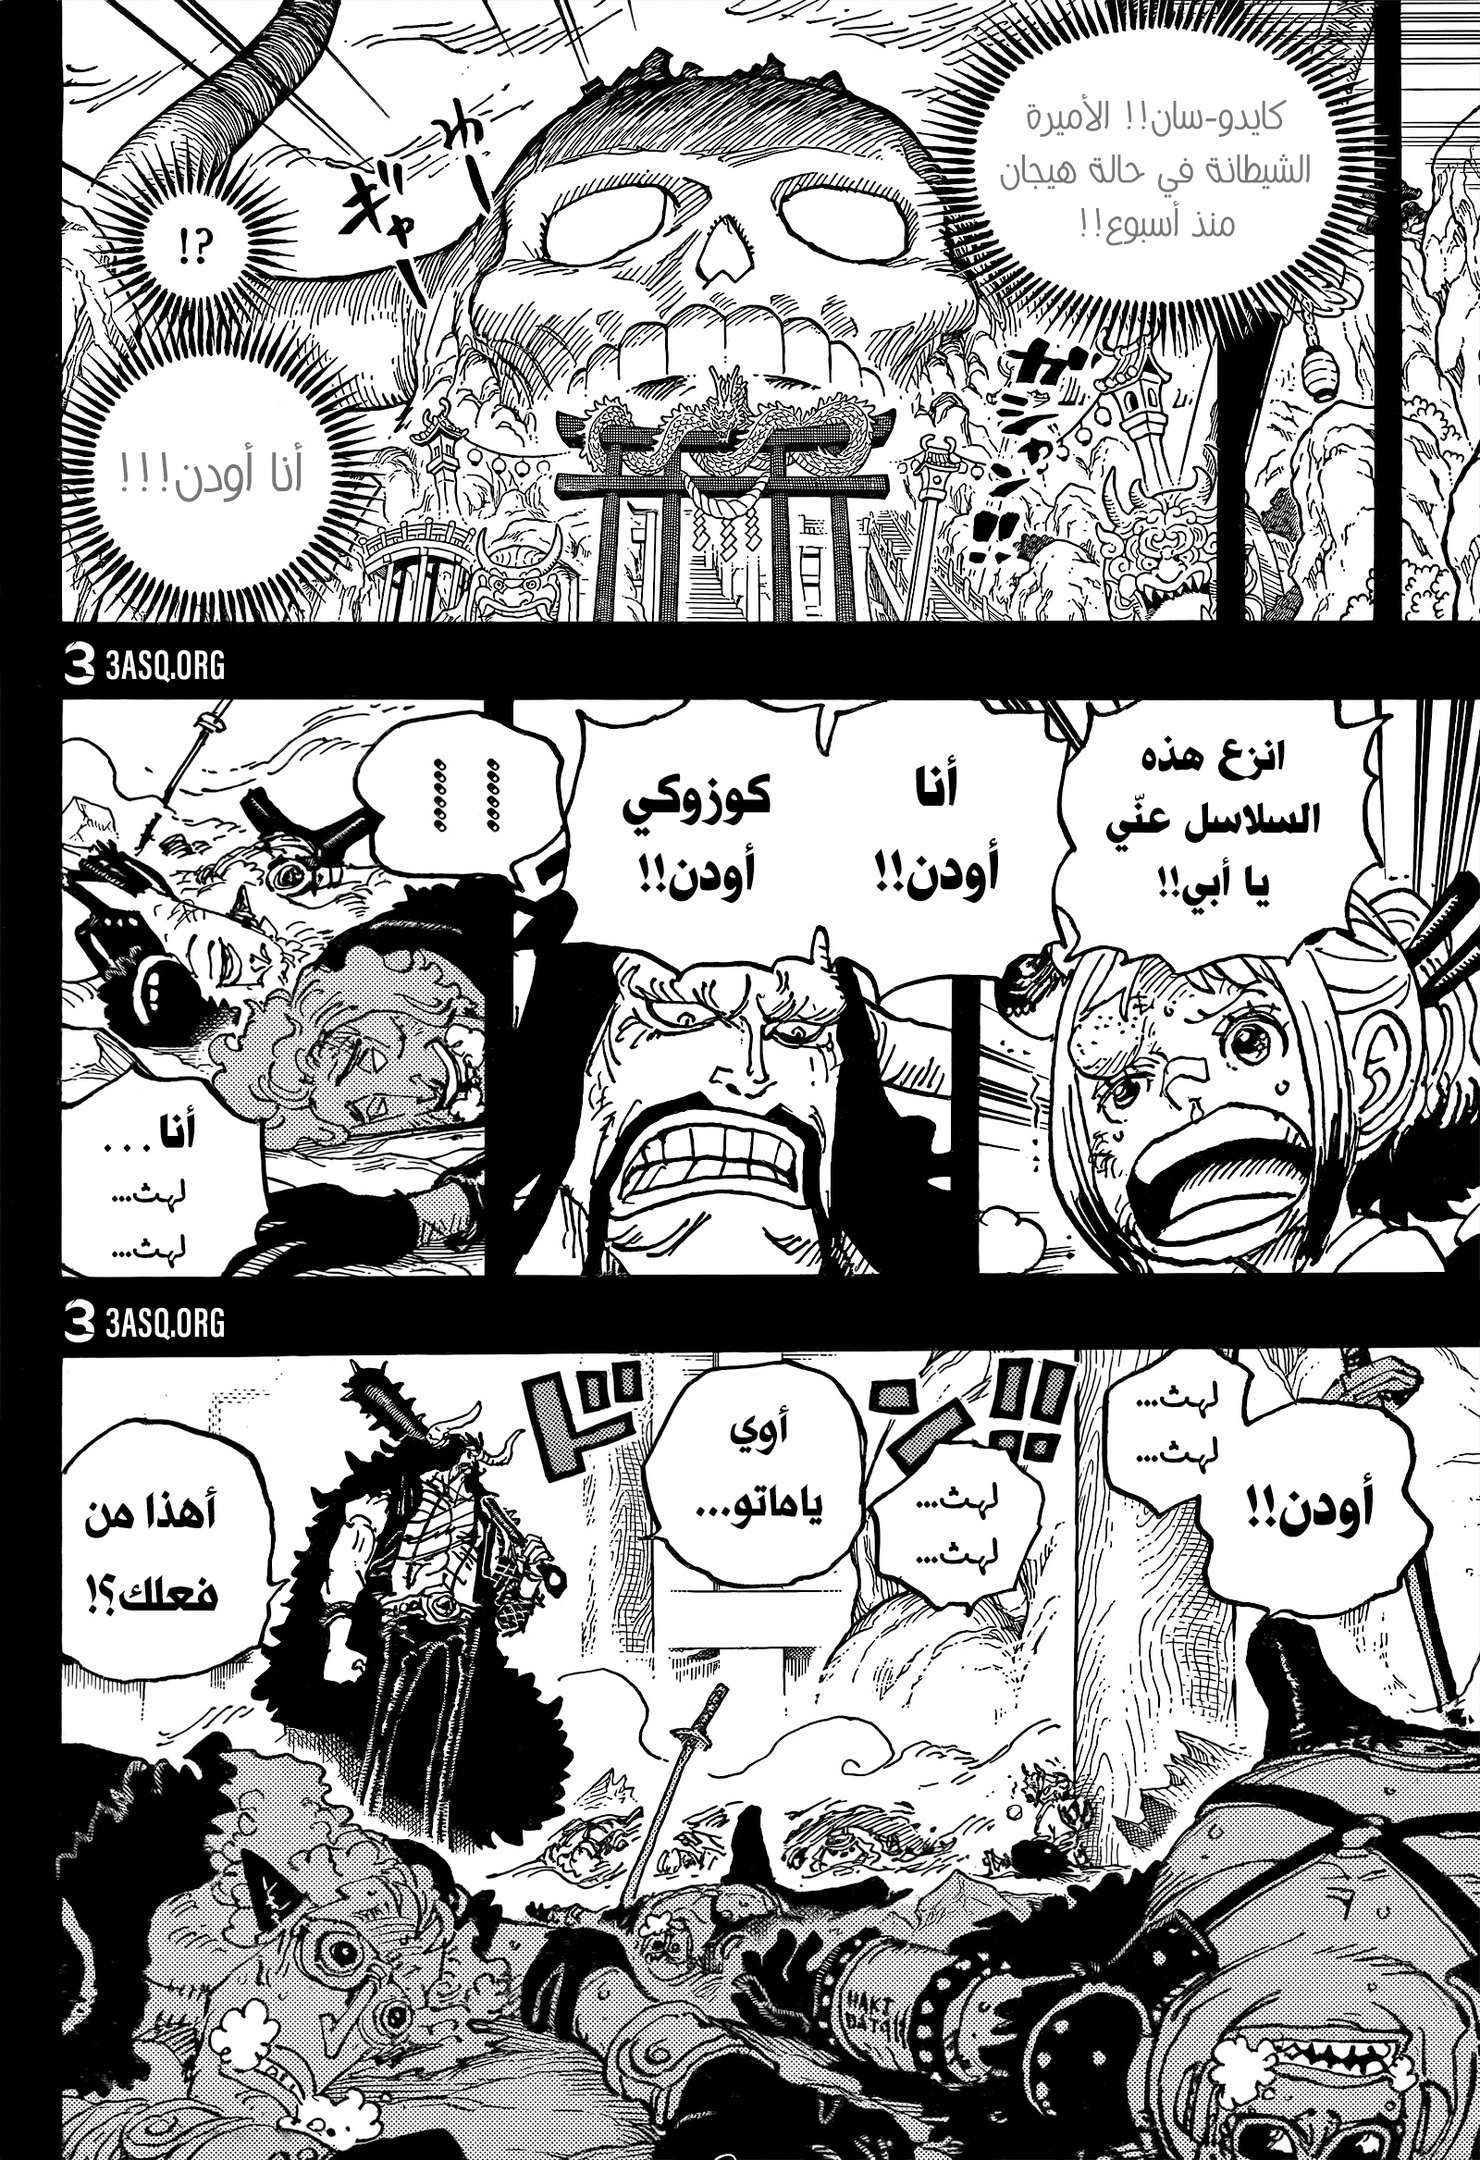 One Piece Arab 1024, image №10